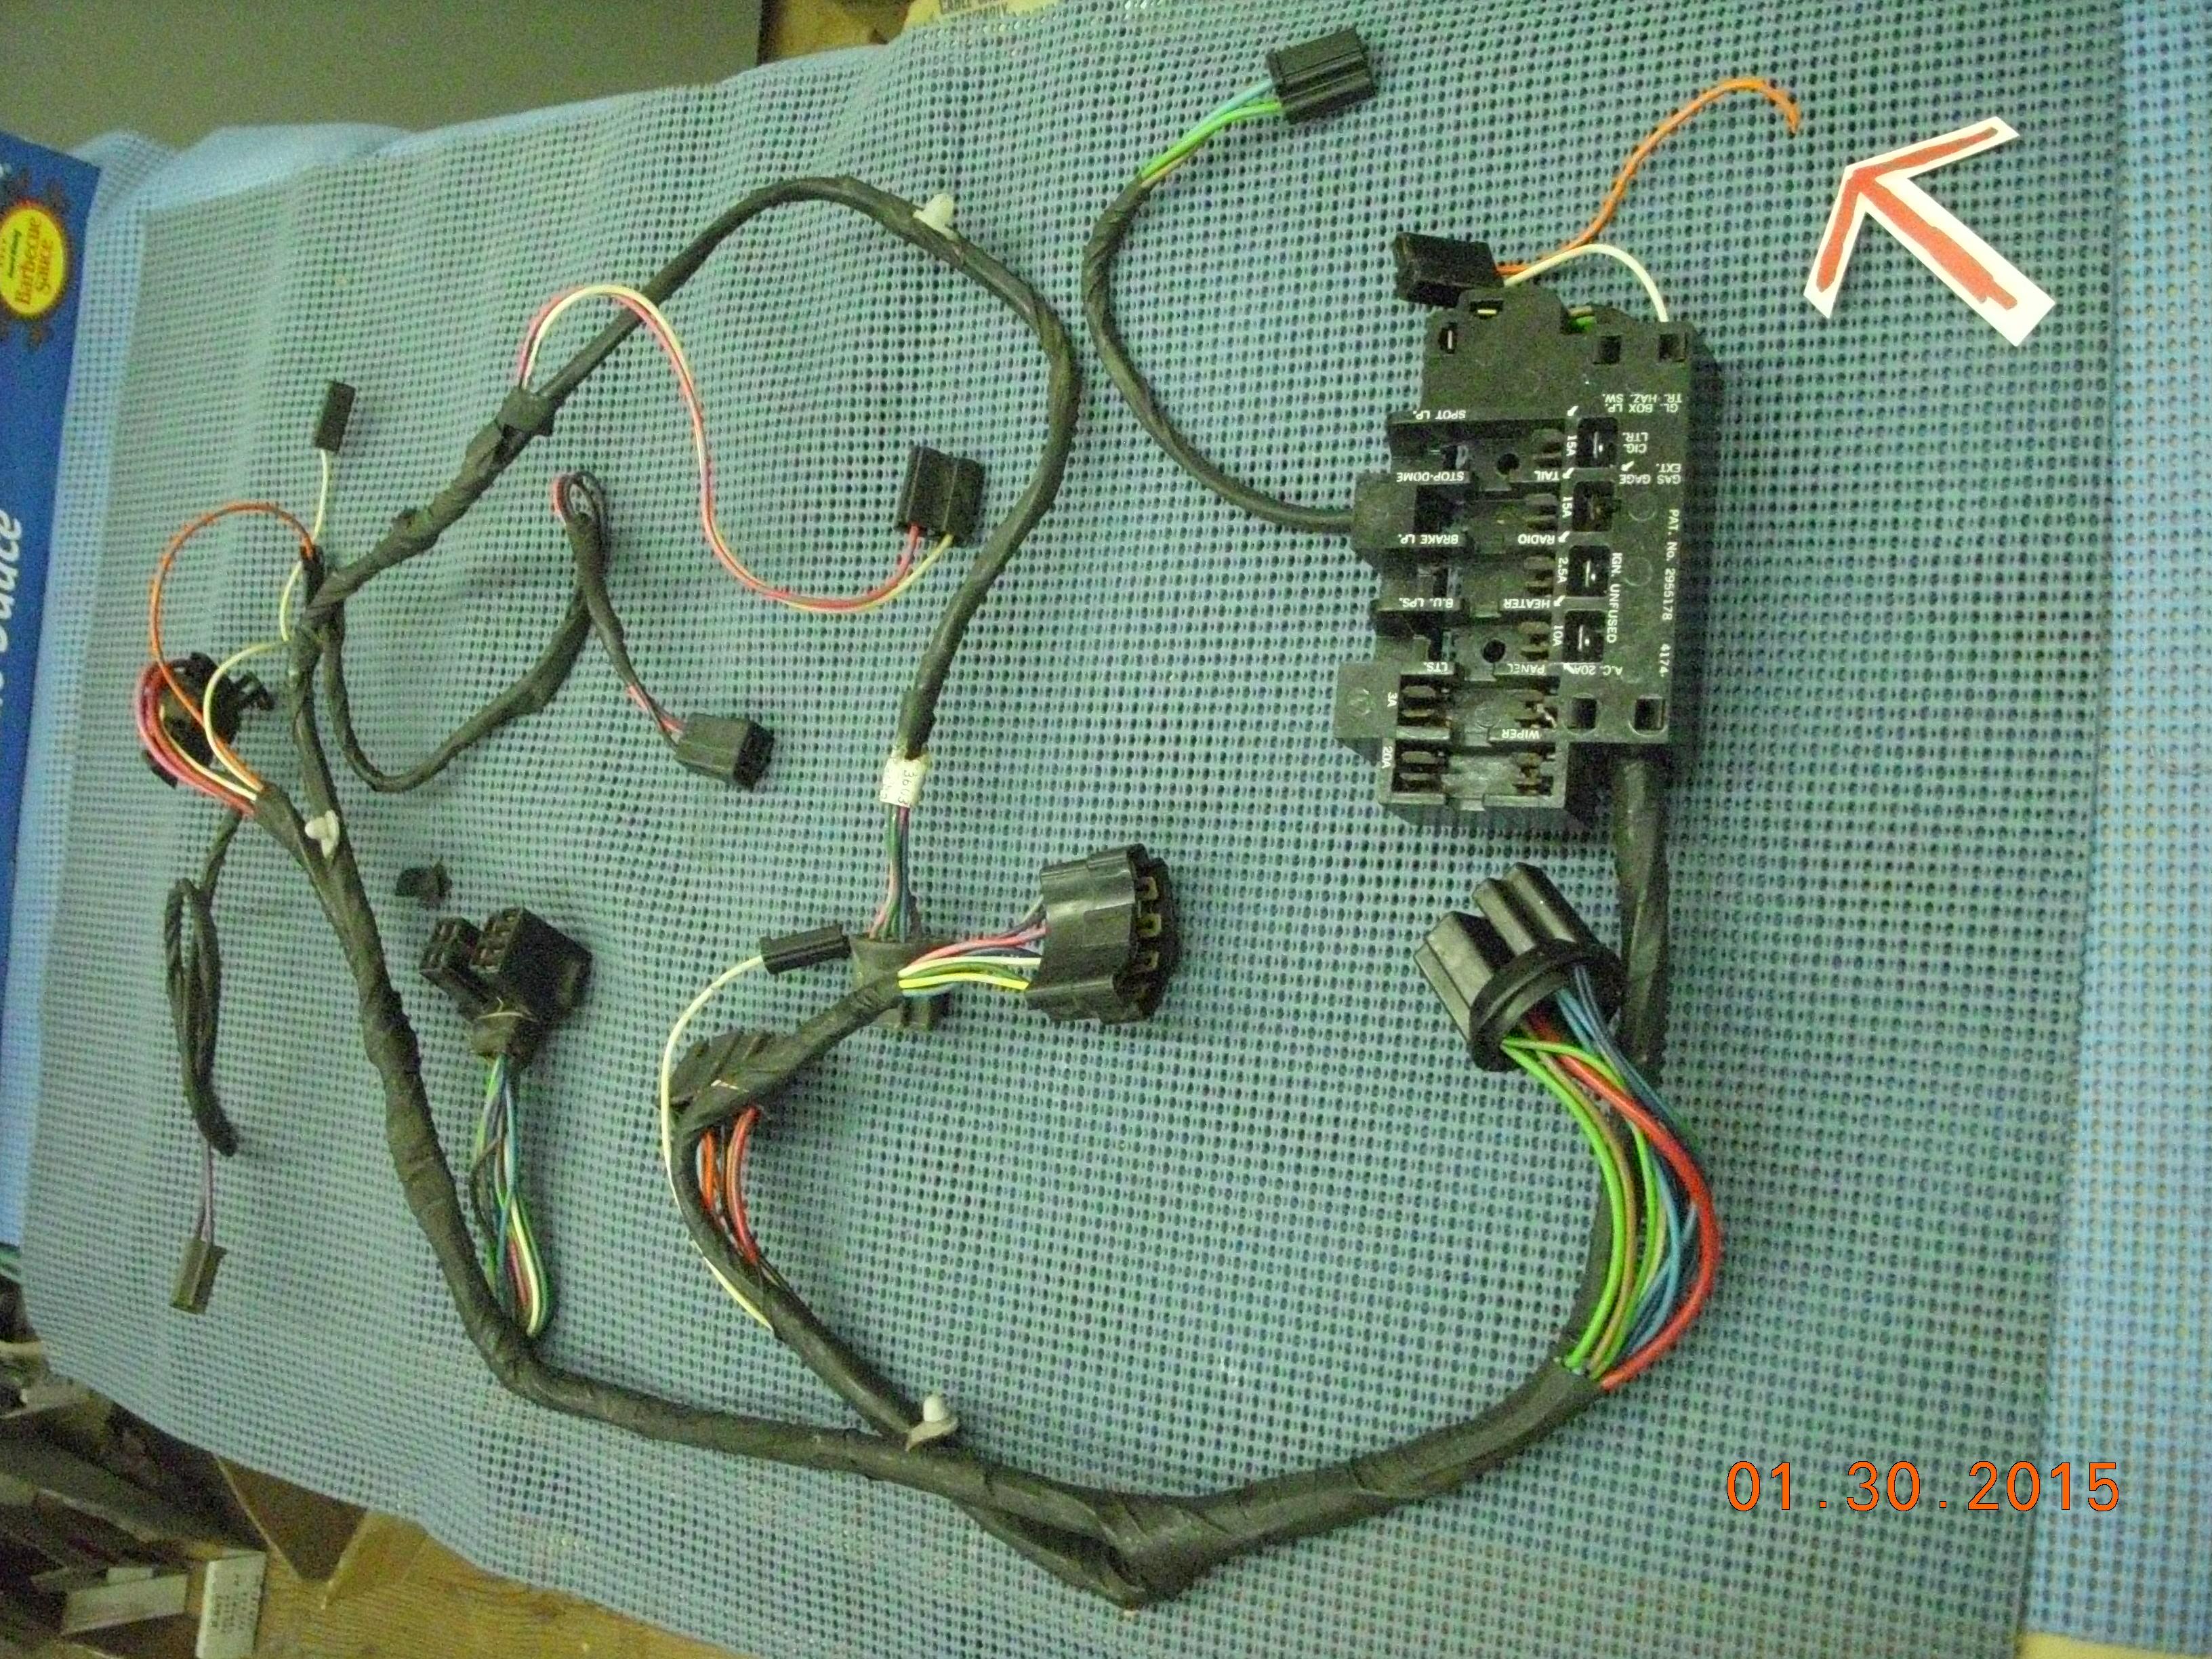 DSCN1418?resize\=300%2C300\&ssl\=1 wiring harness gm 1893623,harness \u2022 limouge co  at suagrazia.org